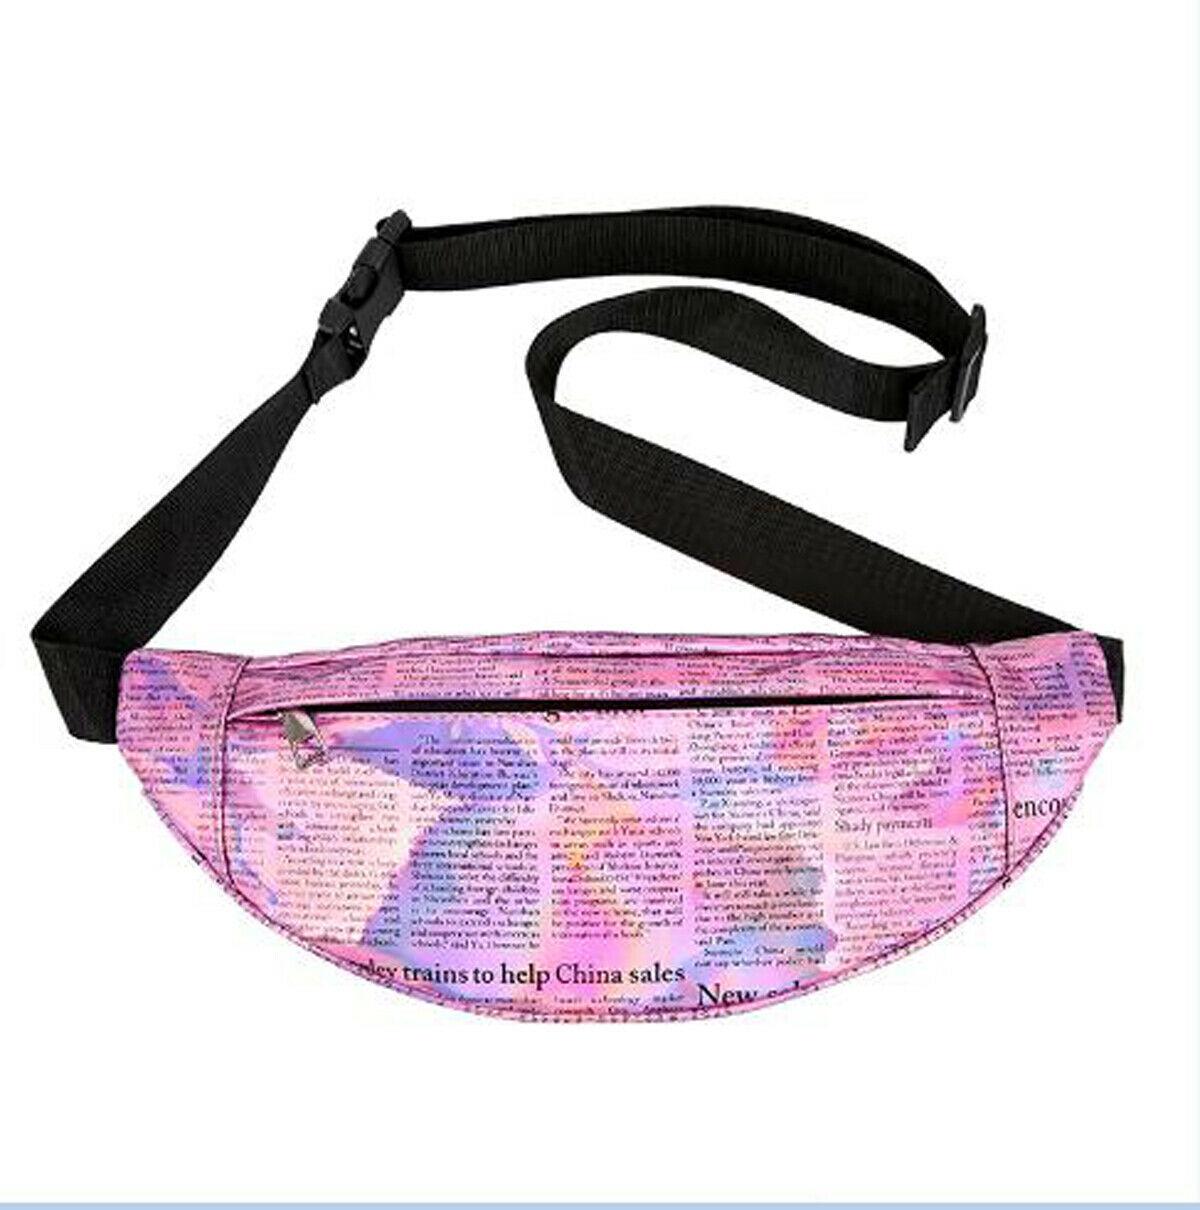 New PU Leather Fanny Pack Women's Hip Hop Waist Bag Fashion Letter Printing Portable Belt Bag Purse